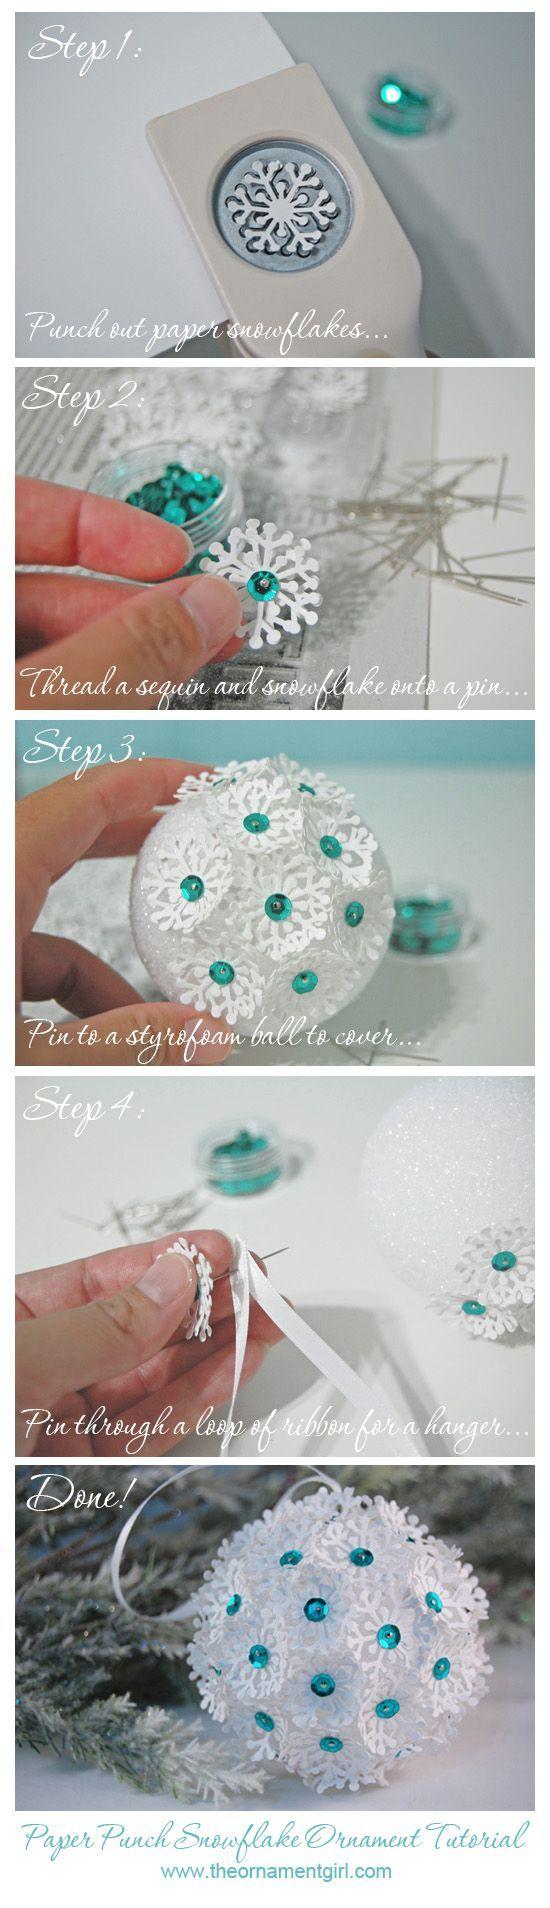 paper ball ornament instructions